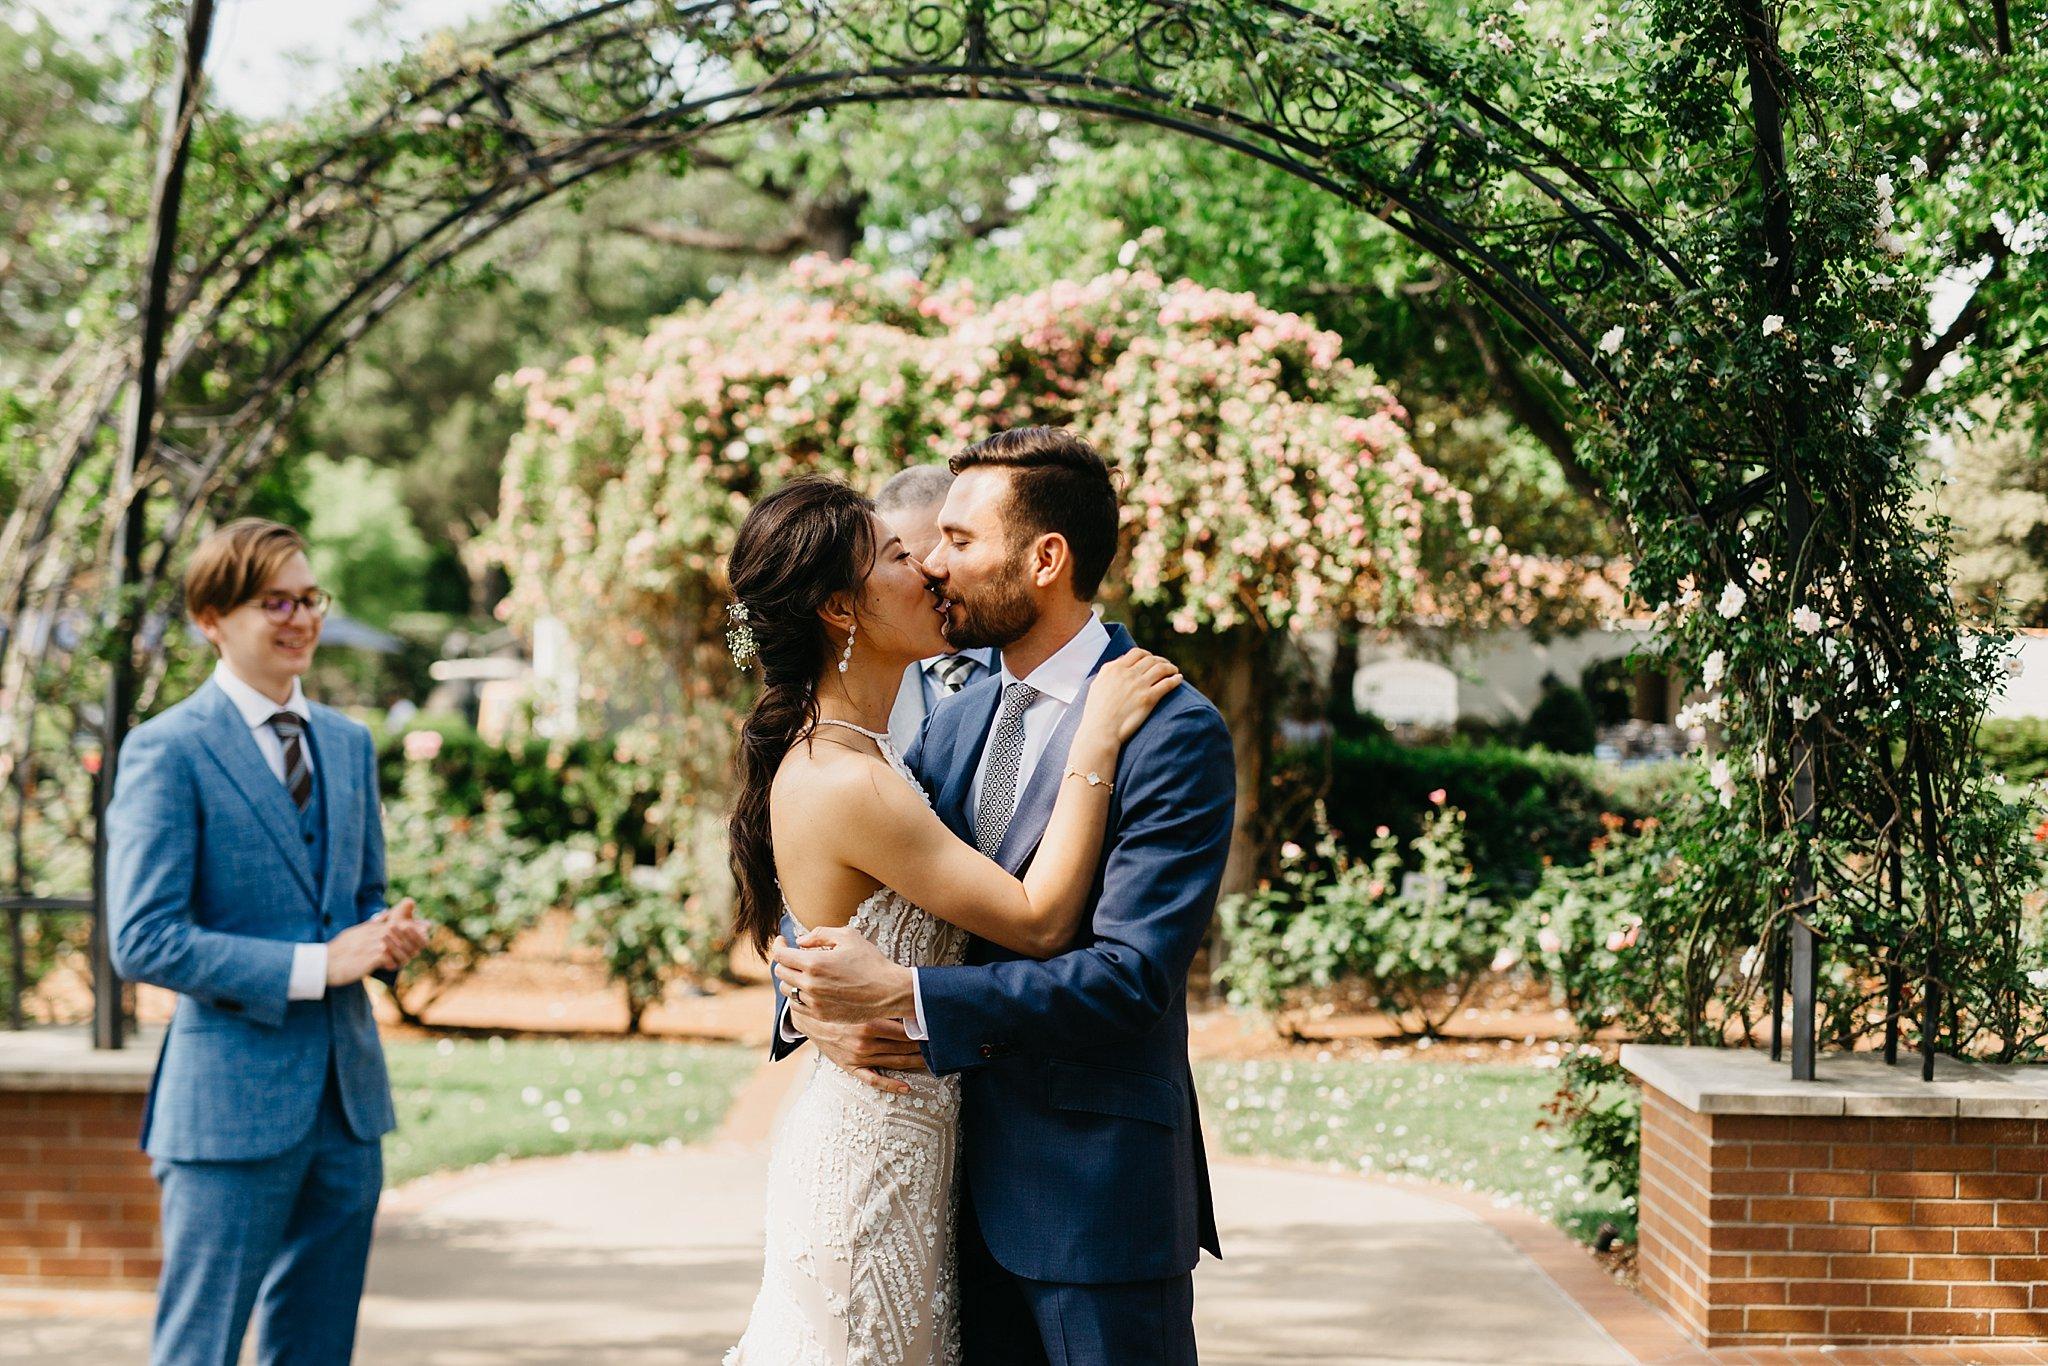 Wilderlove Co_Dallas Texas_Wedding Elopement_Arboretum_Photography_0022.jpg